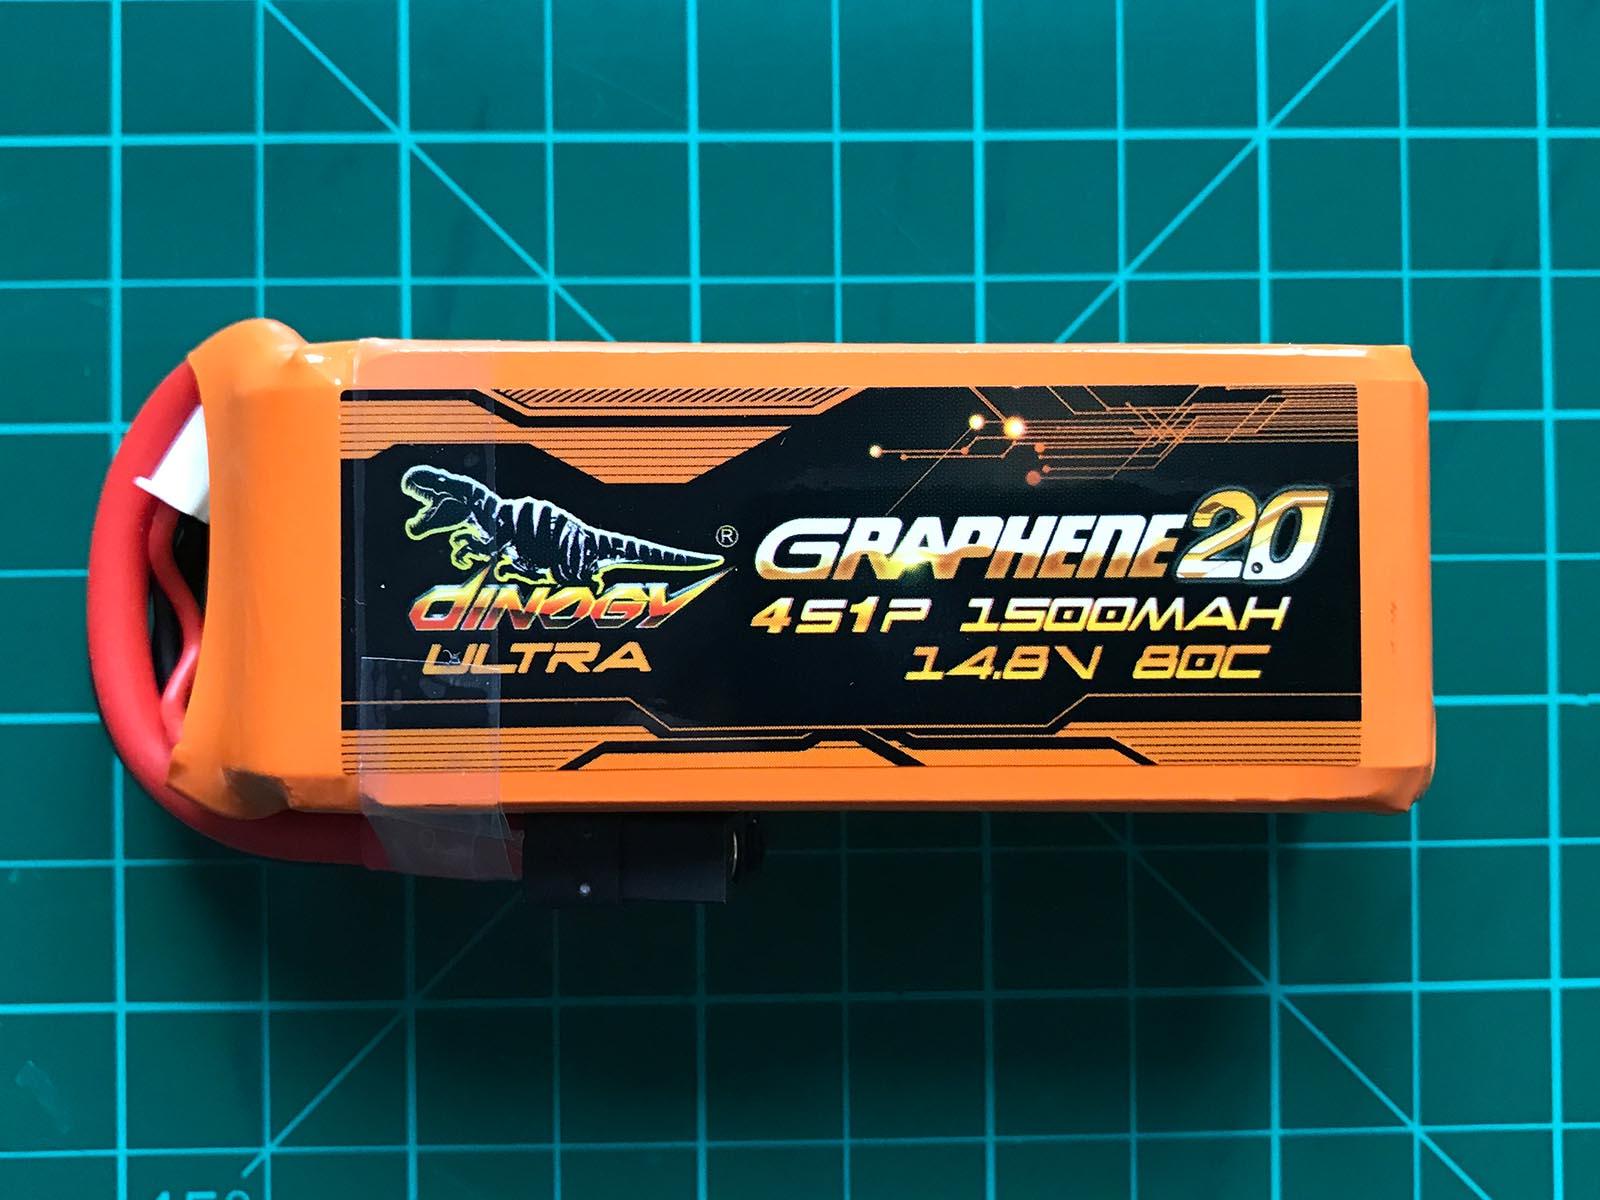 dinogy-ultra-graphene-2-0-4s-1500-mah-80c-front-view